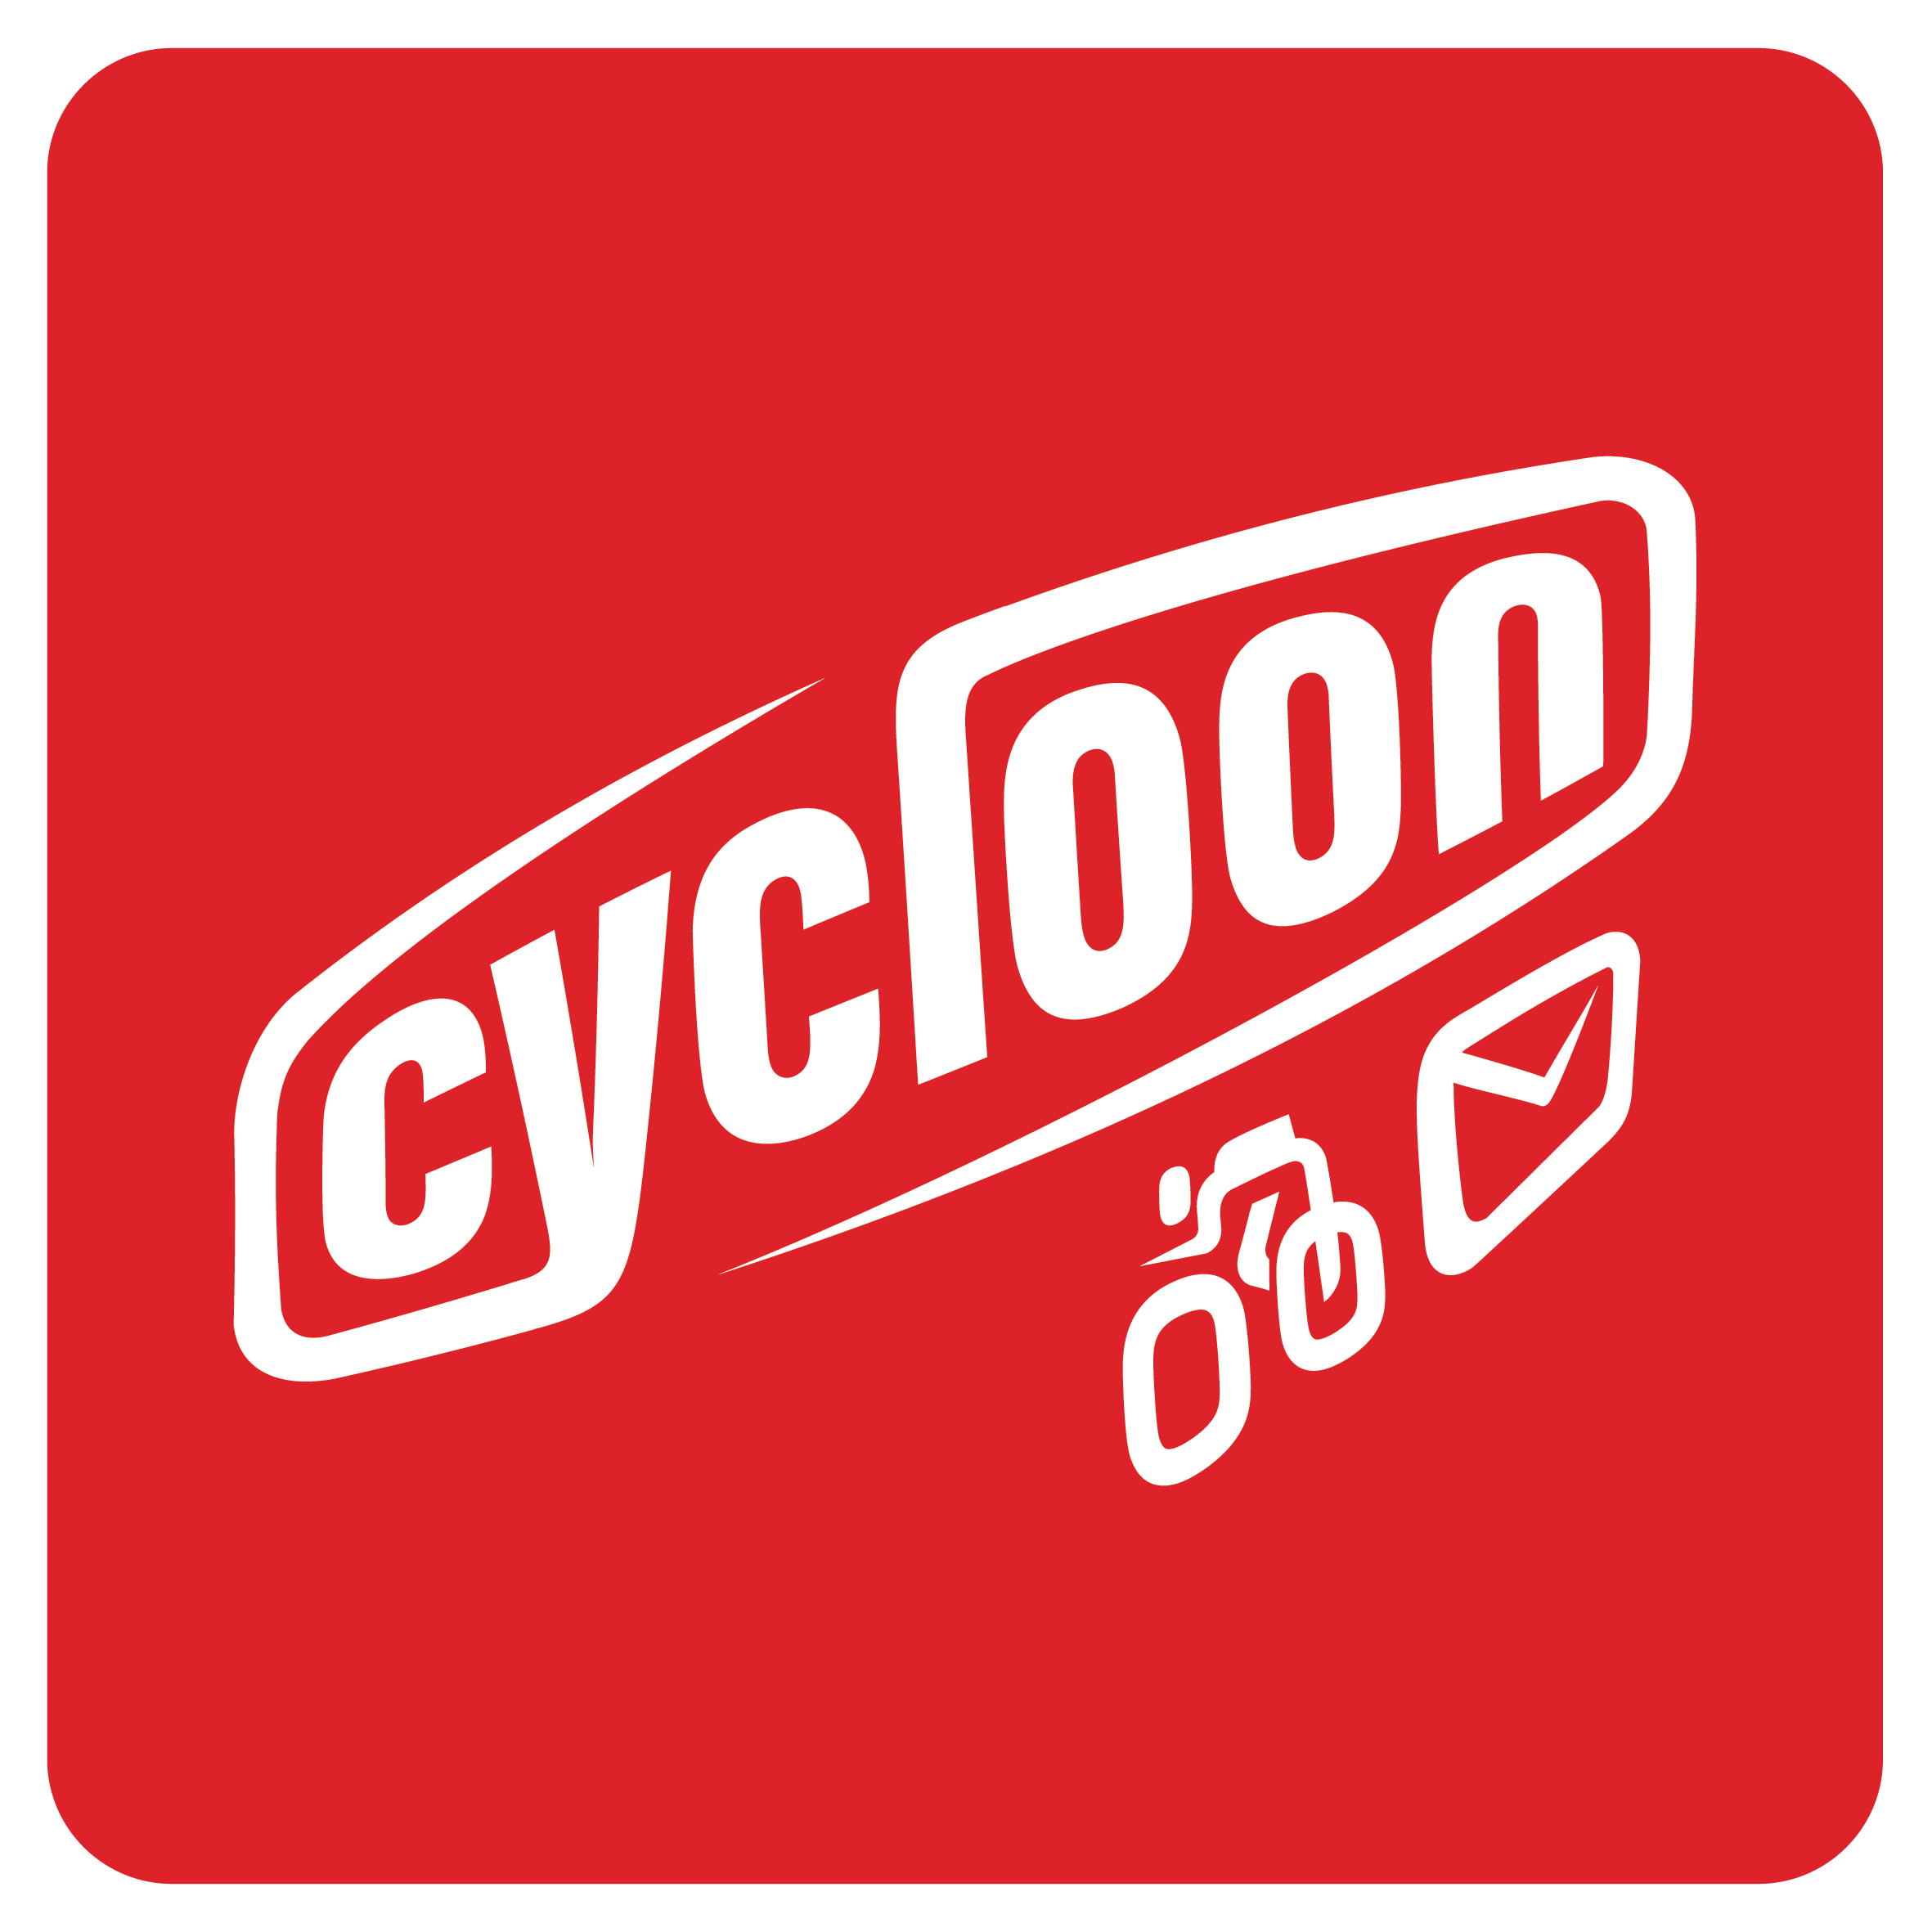 Cycloon fietskoeriers